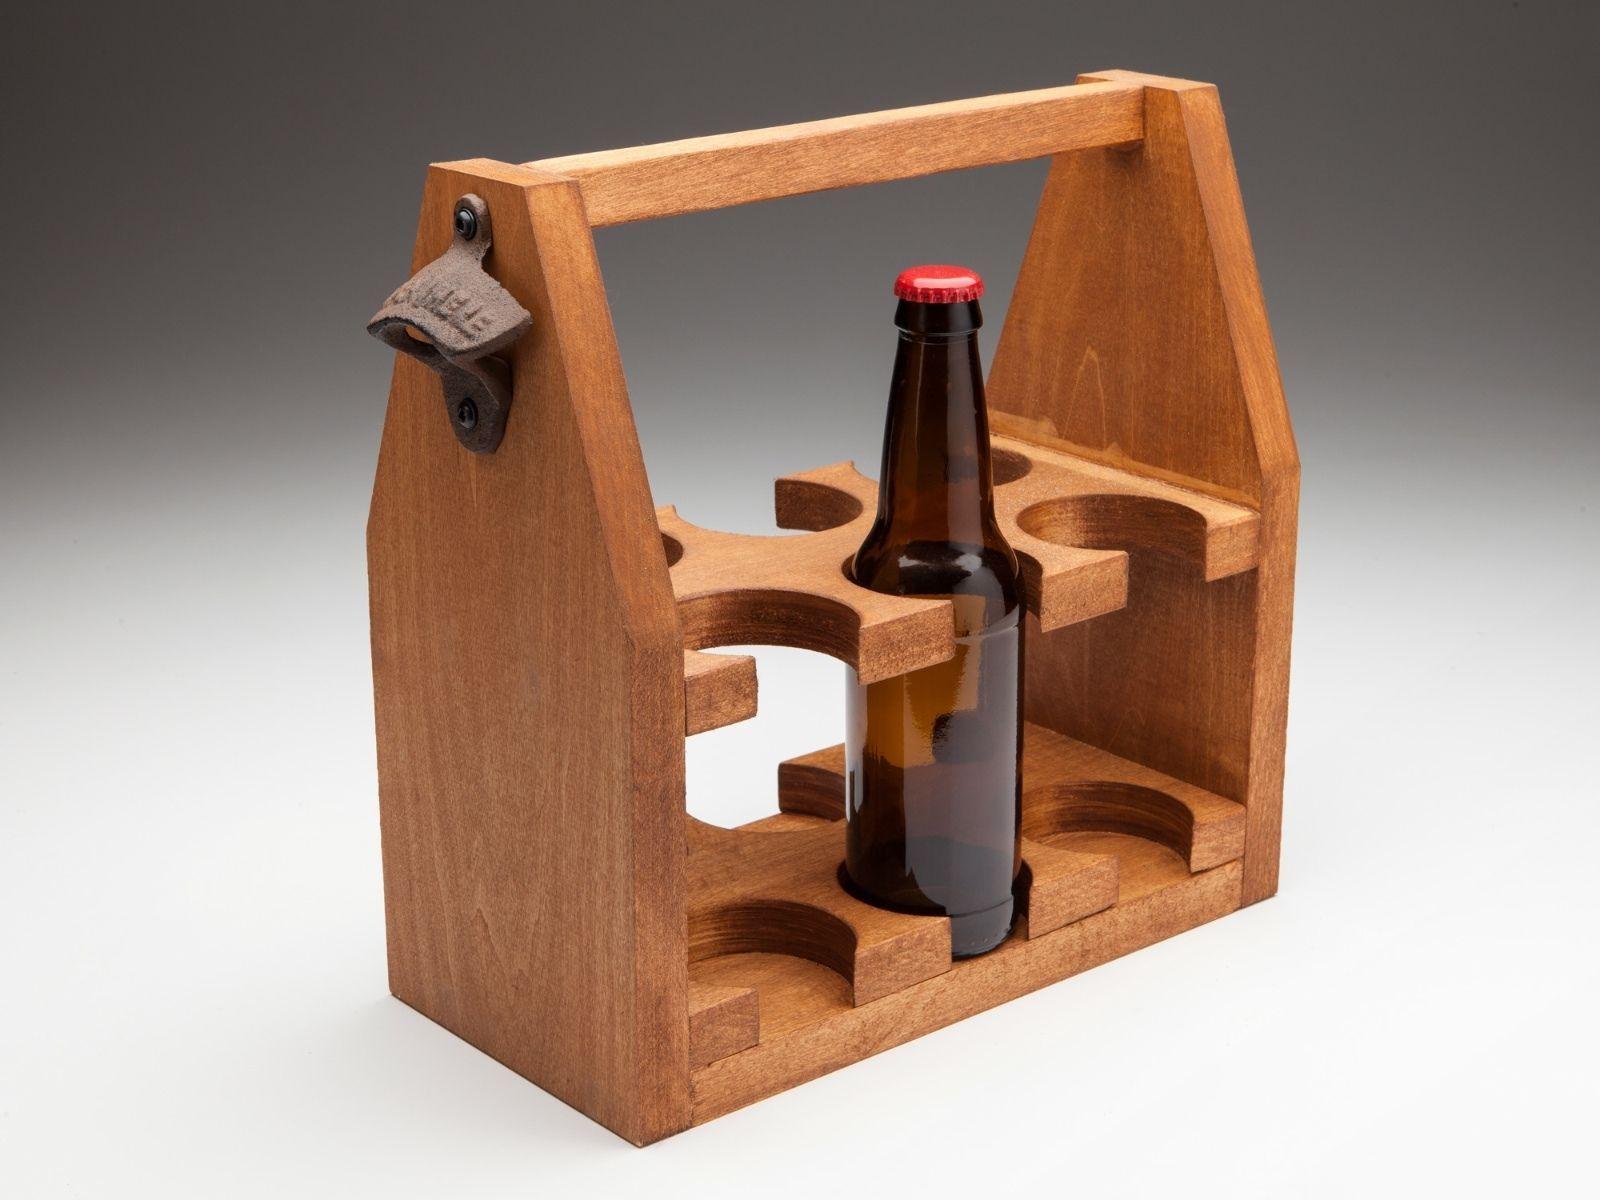 Six Shooter Poplar Wooden Beer Tote Six Pack Carrier Quality Hardwood Bierkasten Holzbearbeitungs Projekte Biertrager